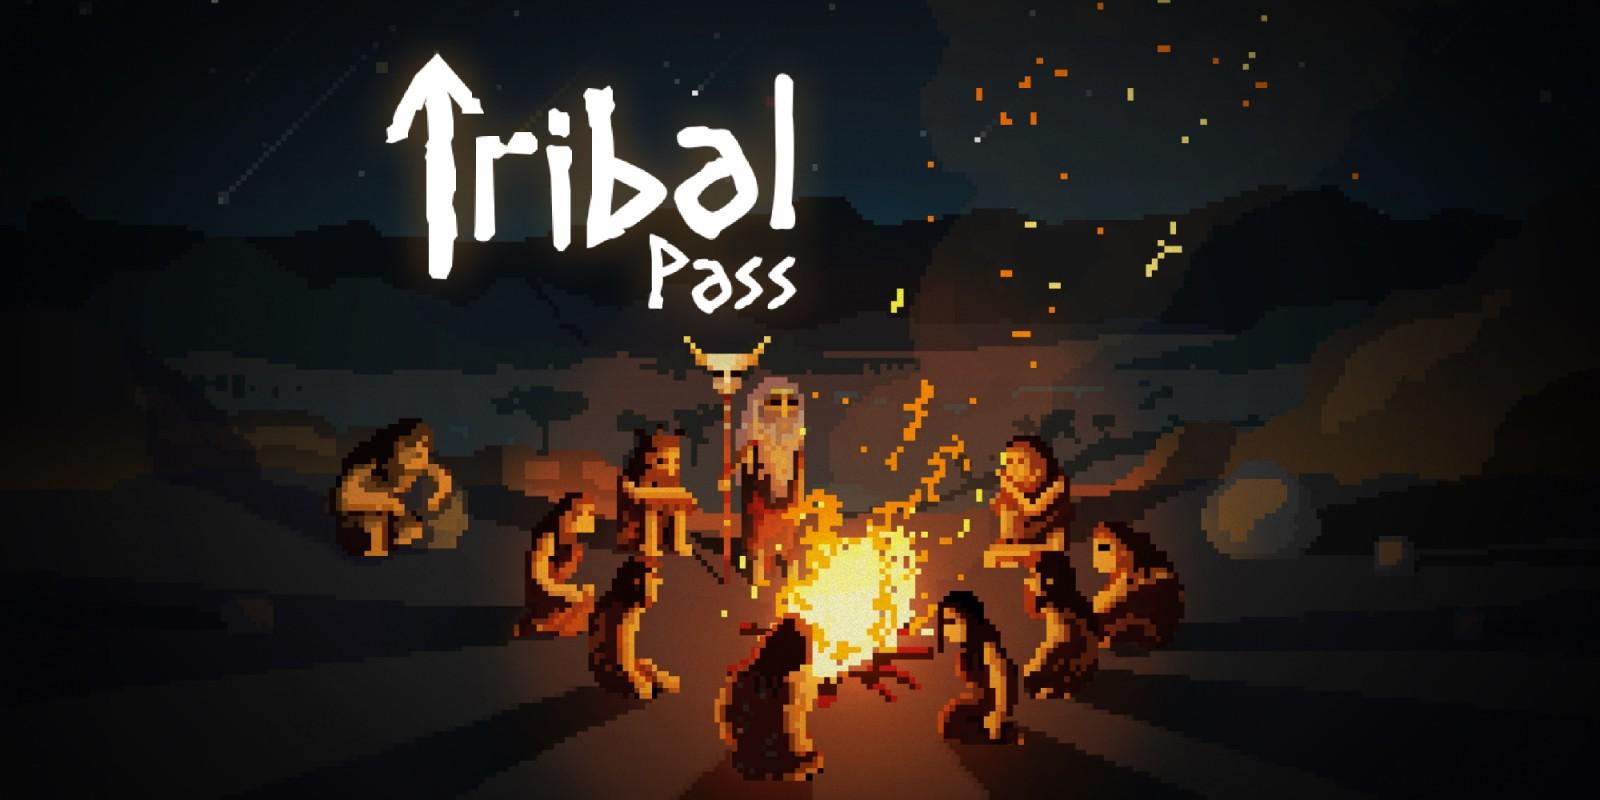 Tribal Pass